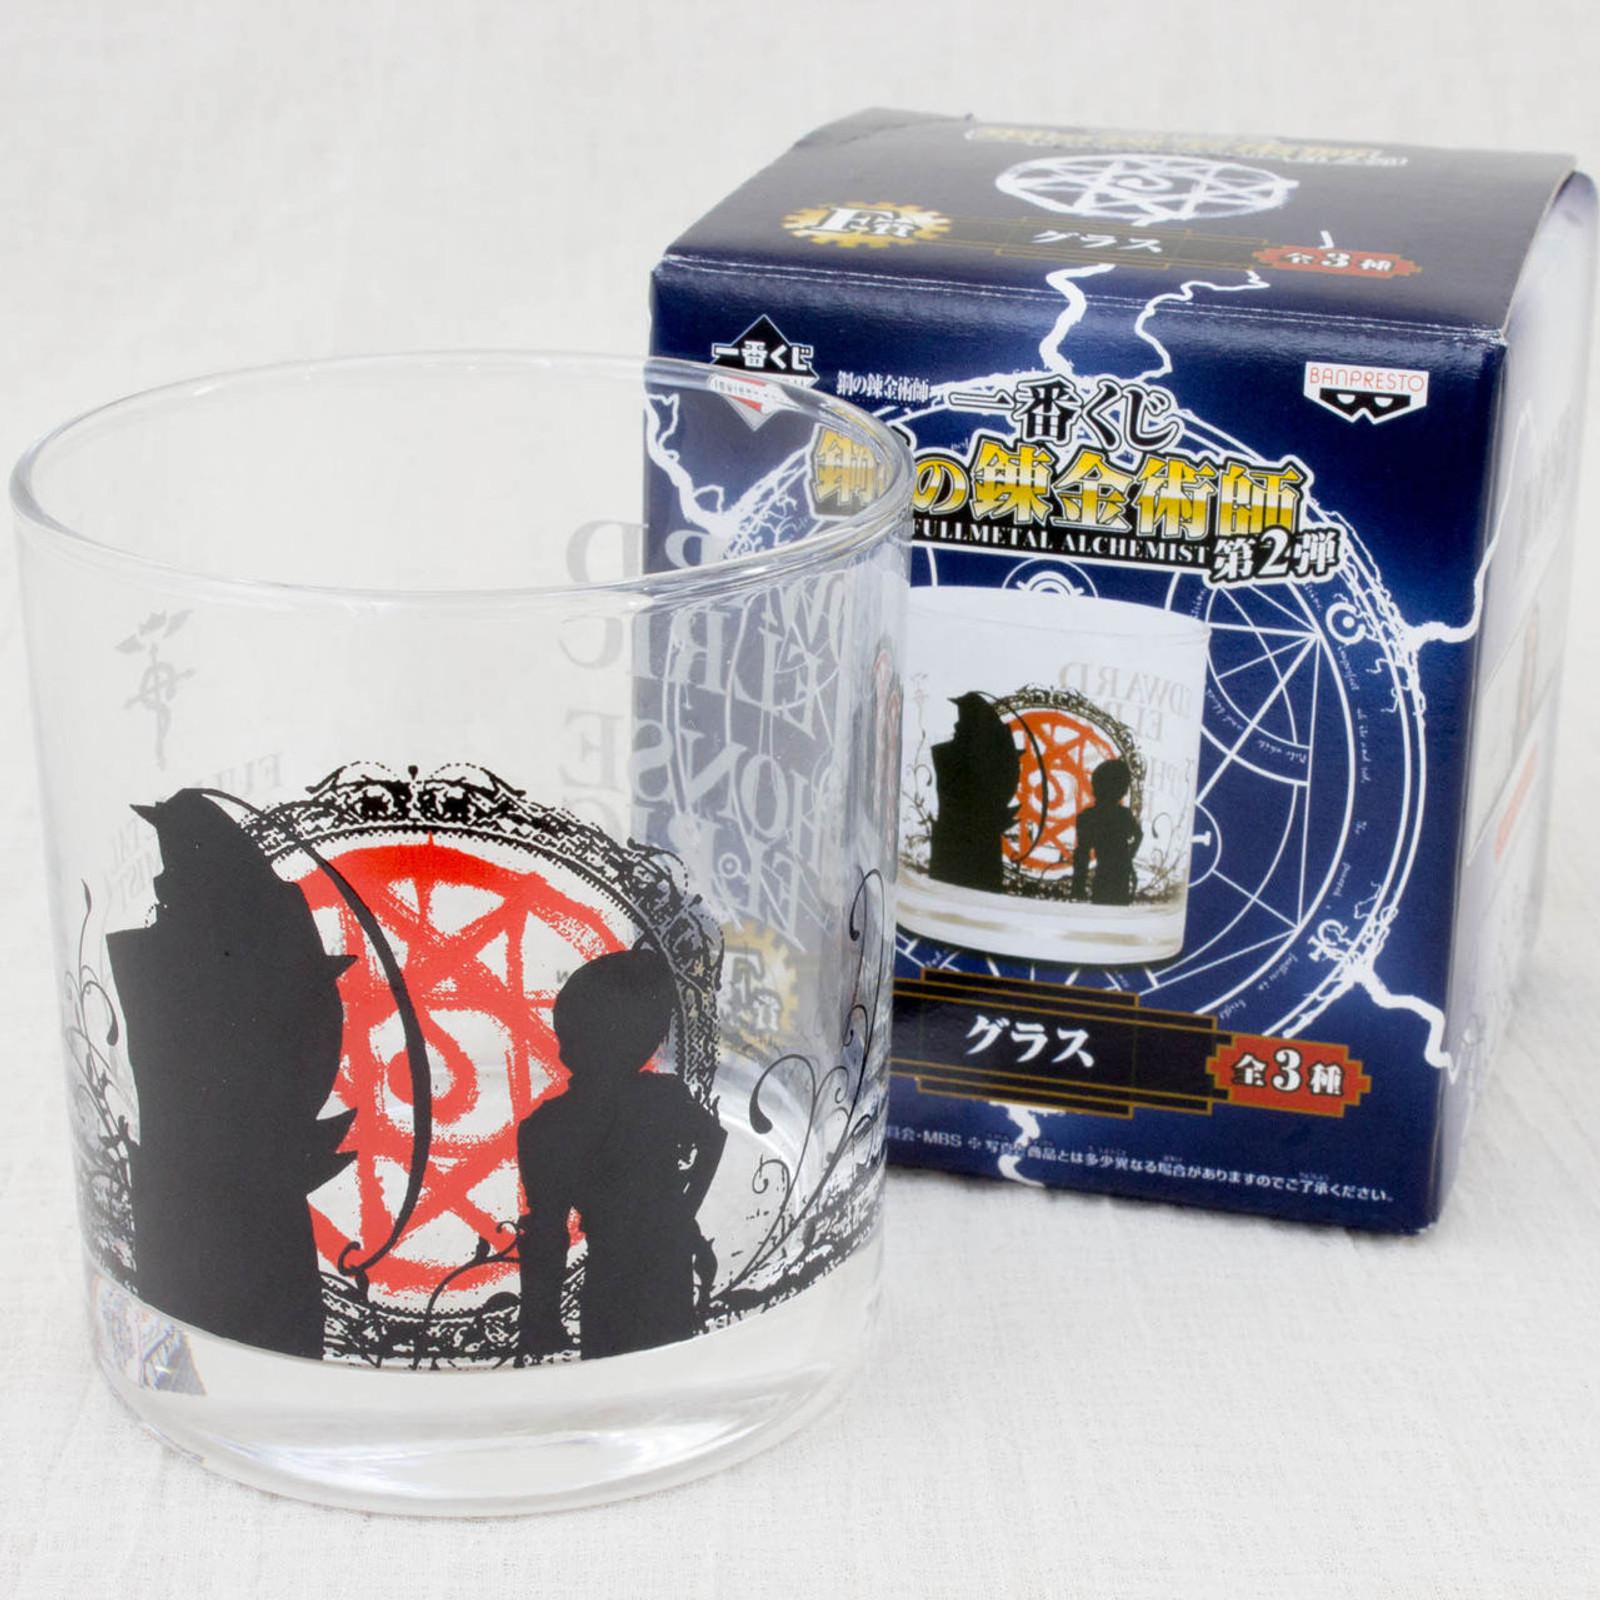 FullMetal Alchemist Glass Edward & Alphonse Elric Banpresto JAPAN ANIME MANGA